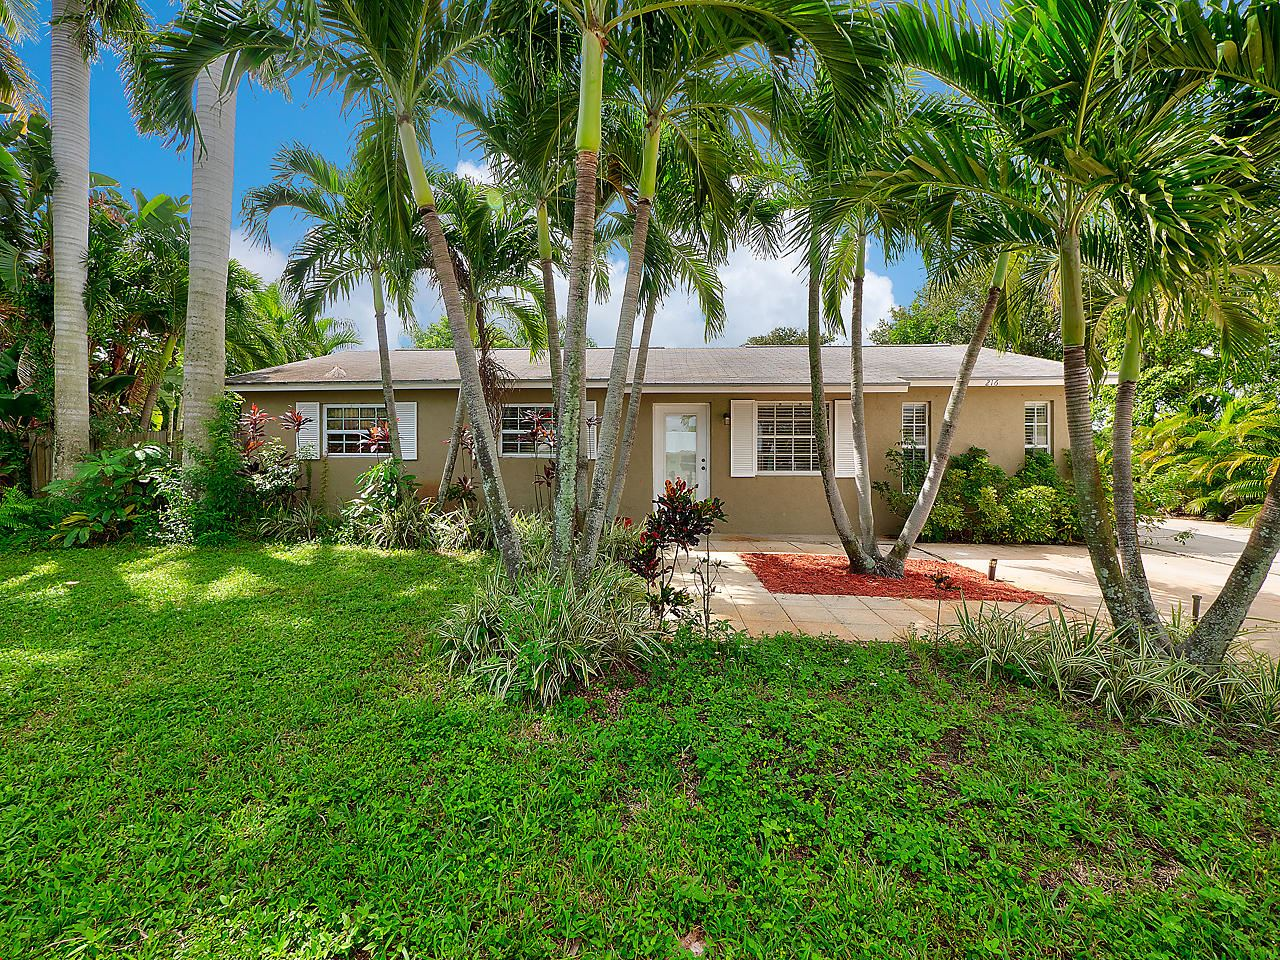 216 River Terrace Drive, Jupiter, FL 33469 - #: RX-10655247